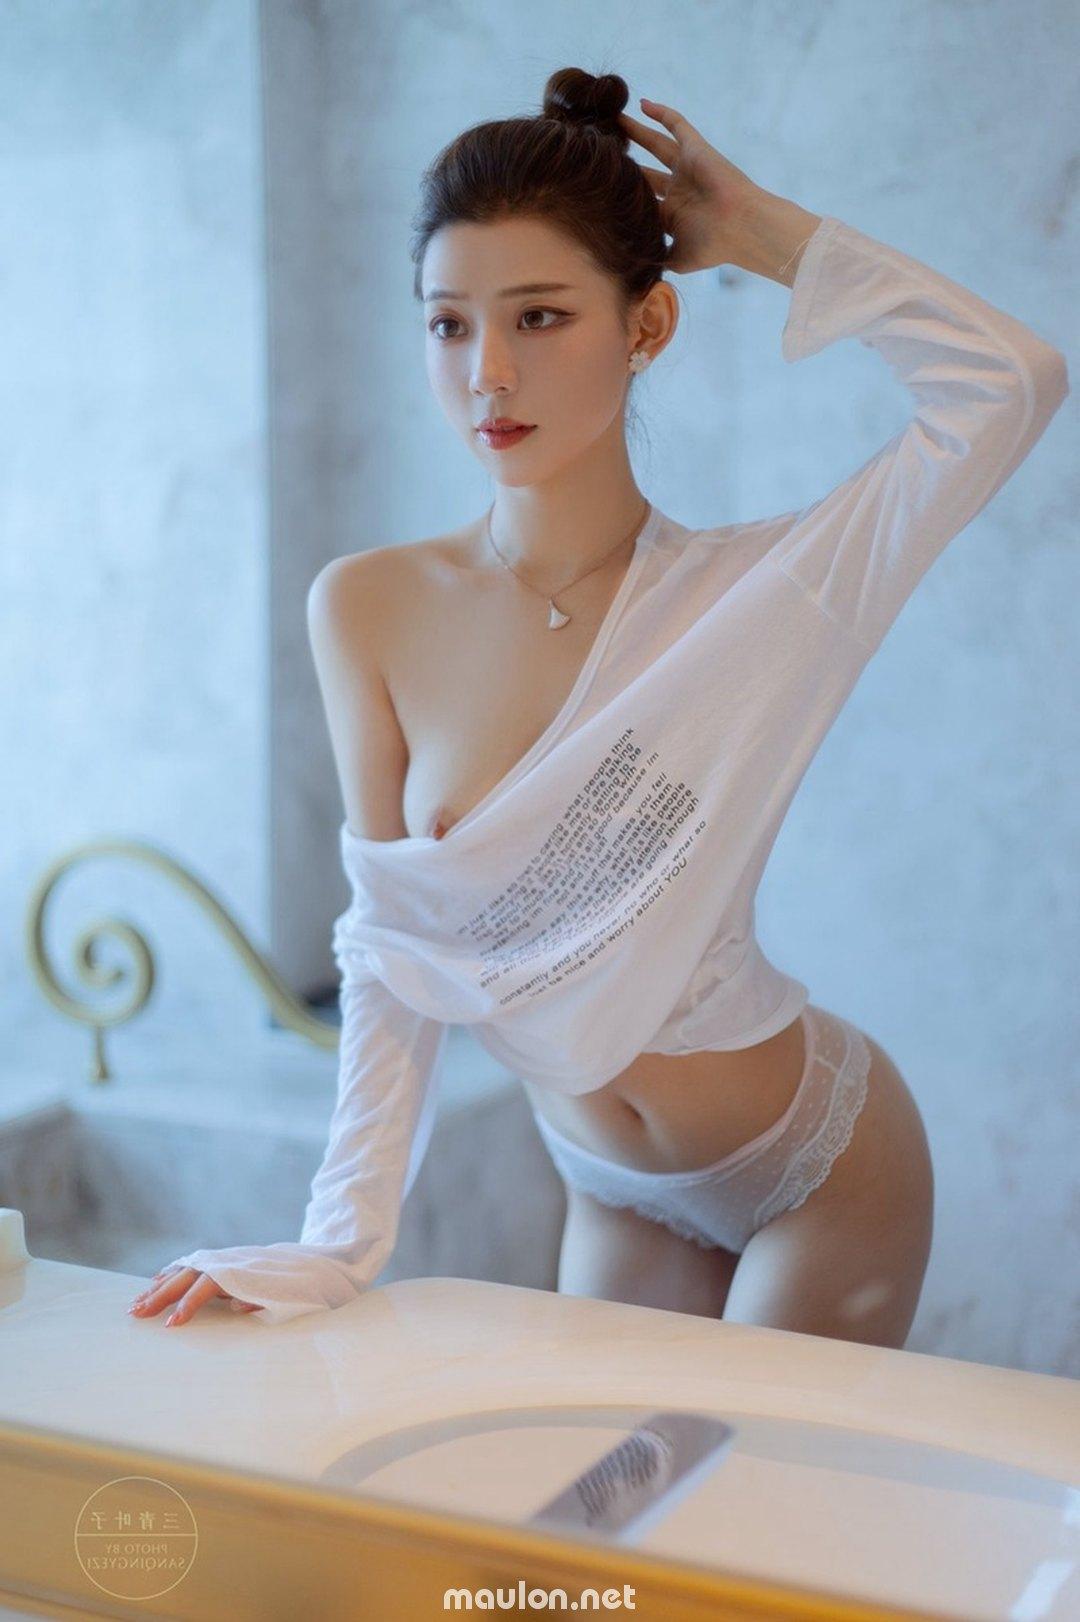 MauLon.Net - Ảnh sex em hot girl siêu nuột